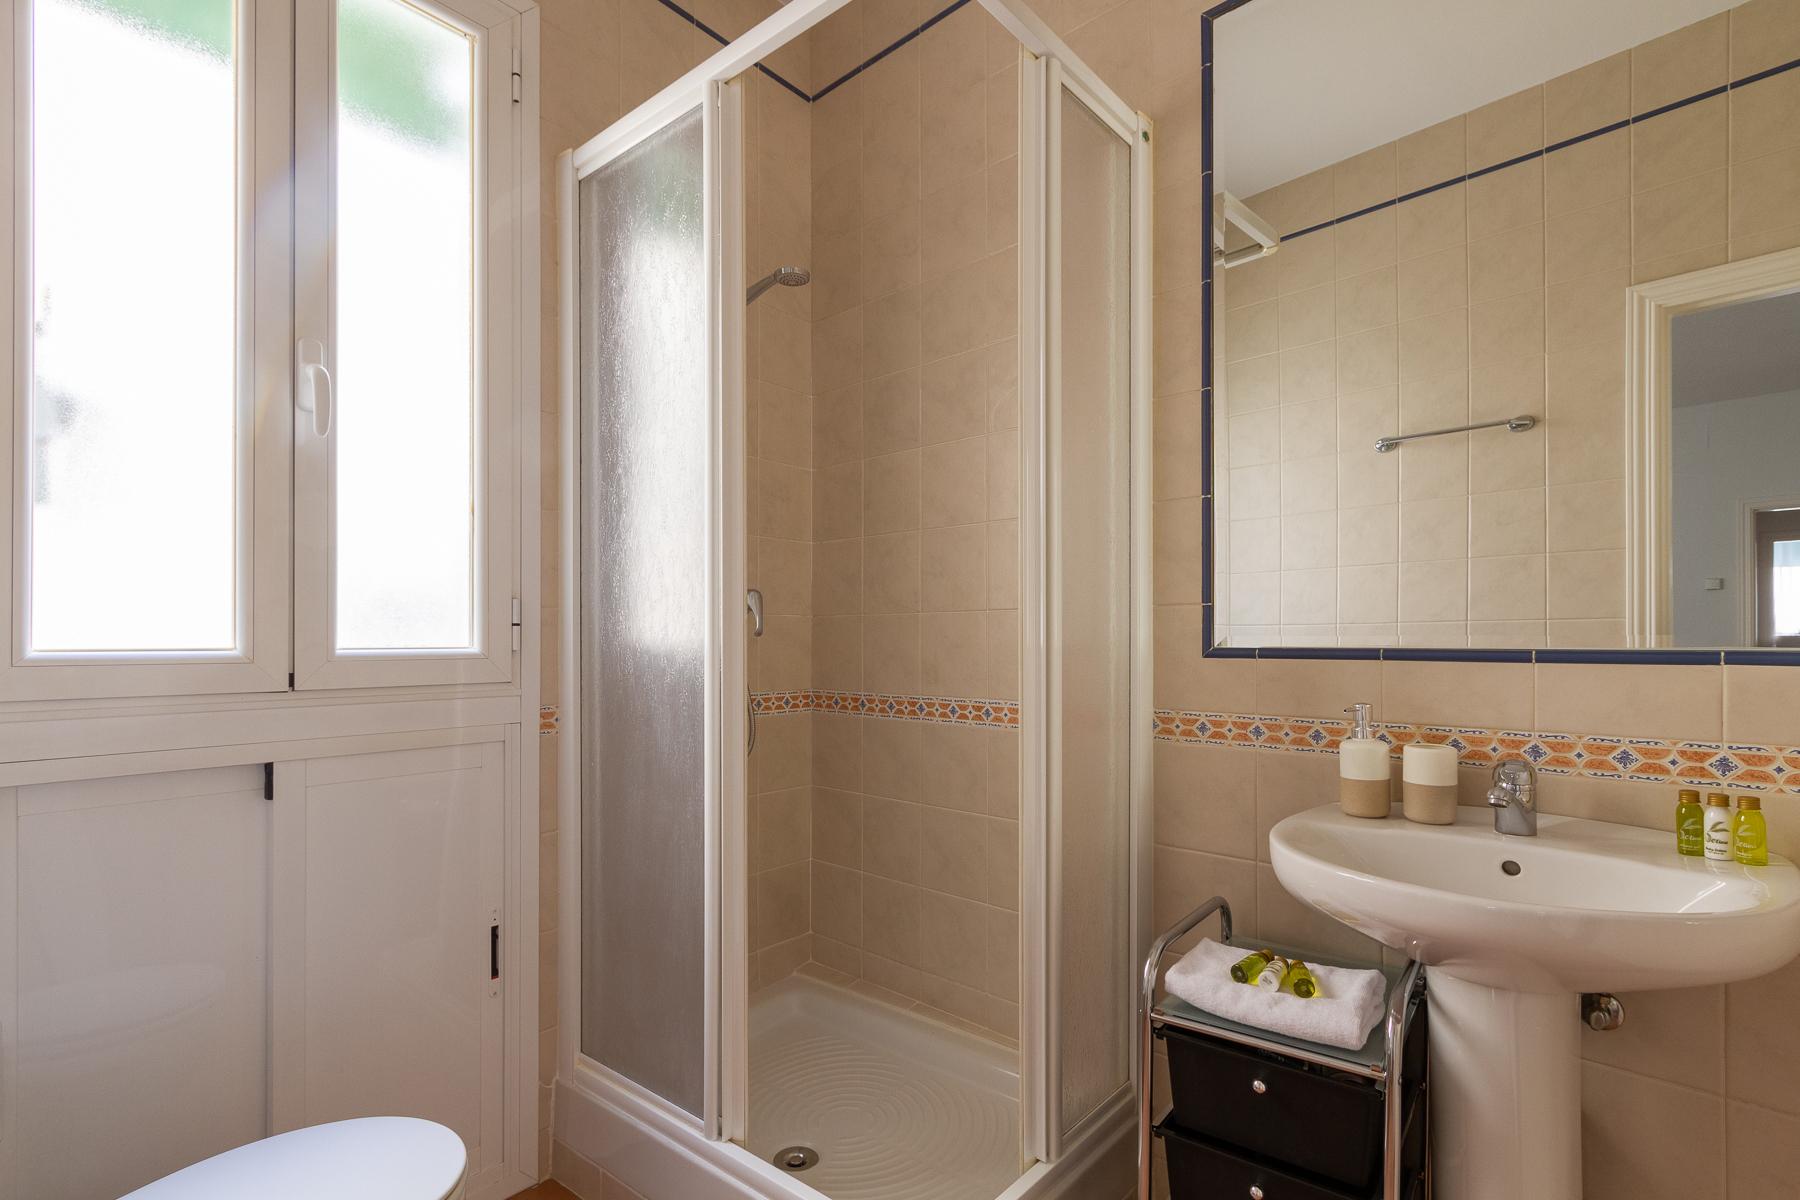 Bathroom at Fernan Gonzalez Apartments